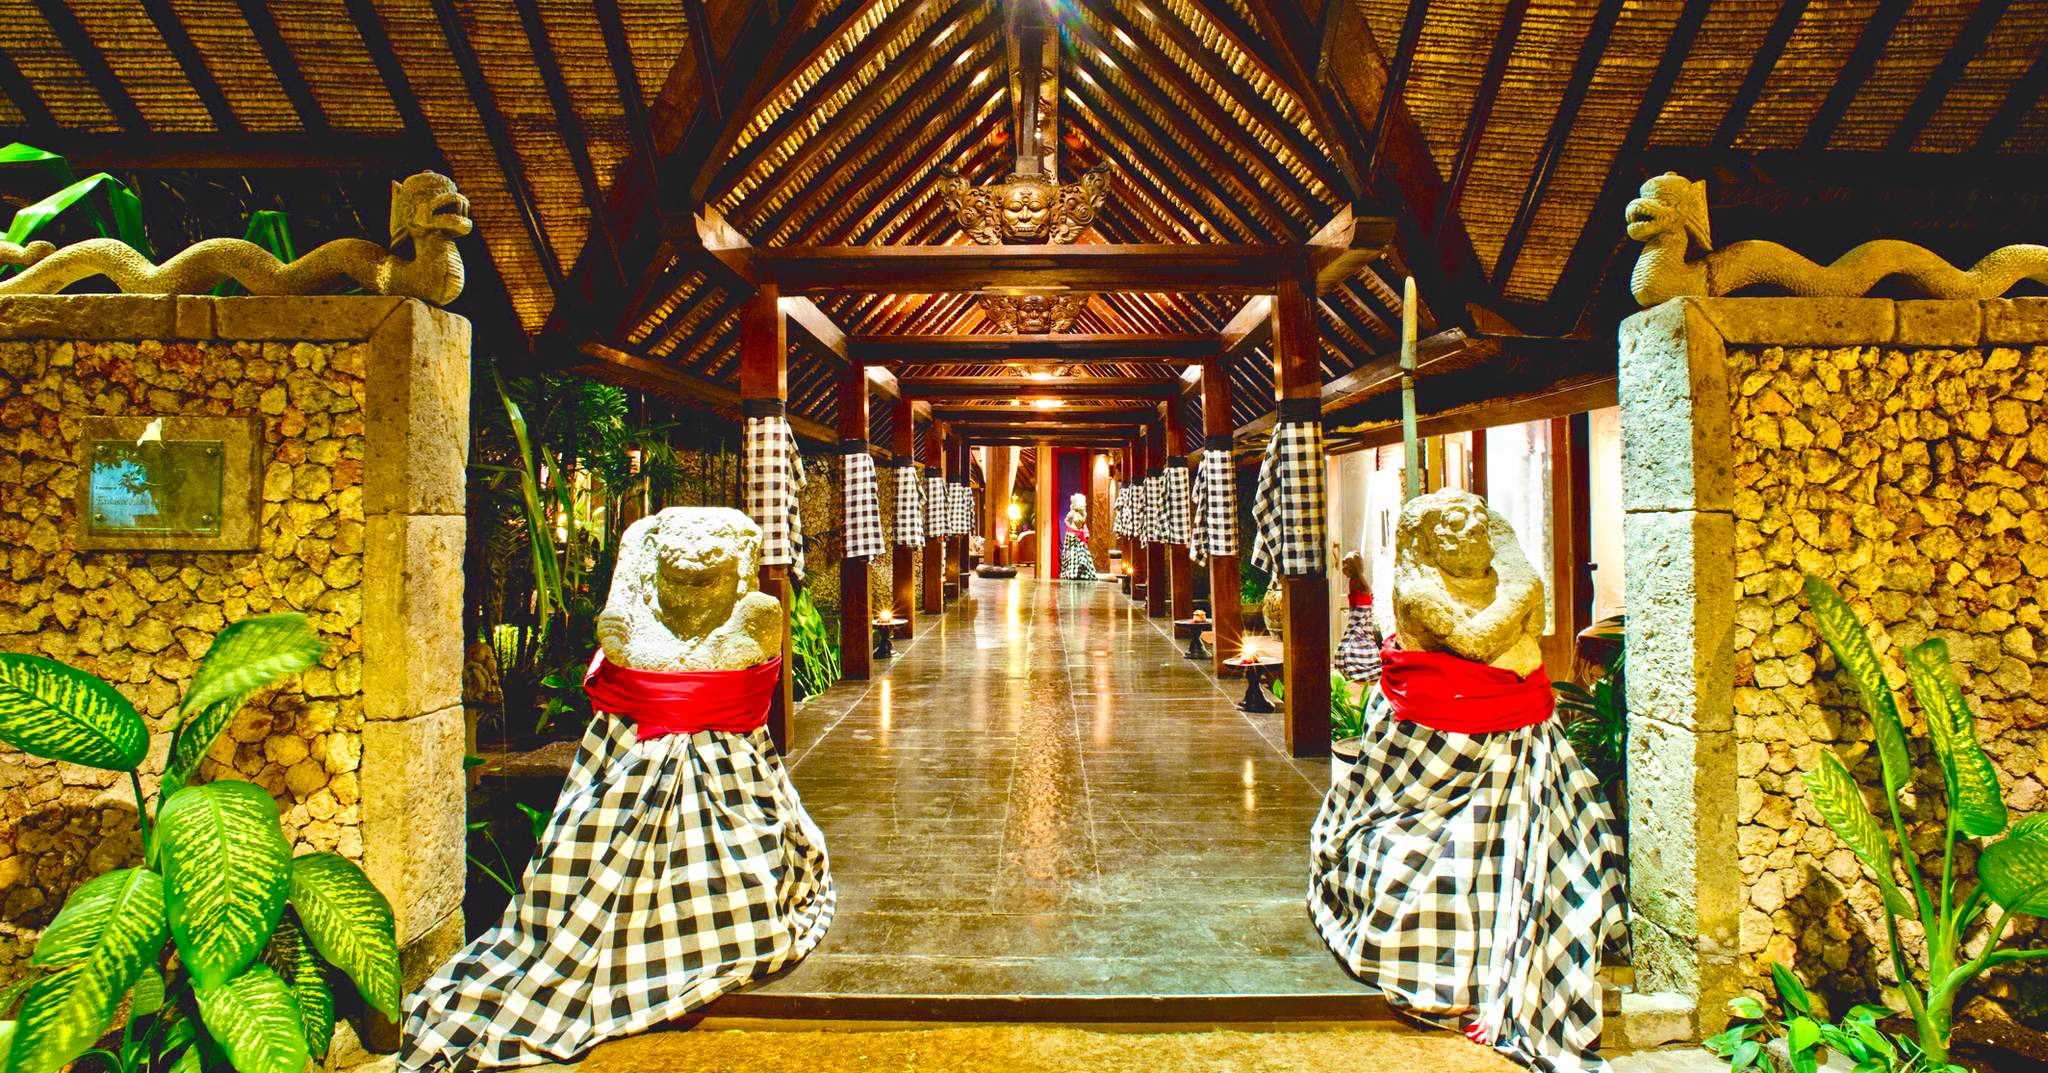 Hotel tugu bali 1 in bali indonesia for Five star hotels in bali indonesia